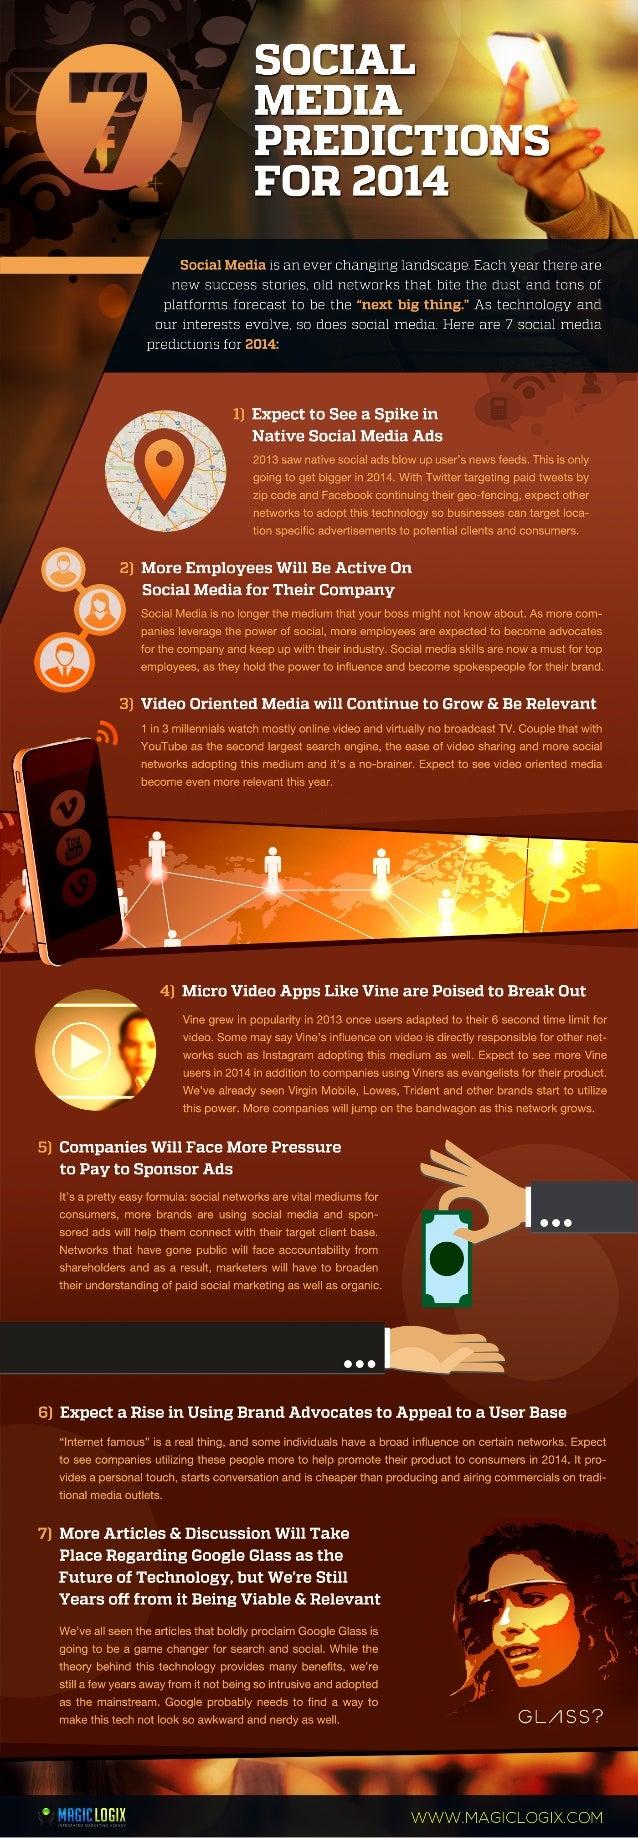 2014 Social Media Predictions